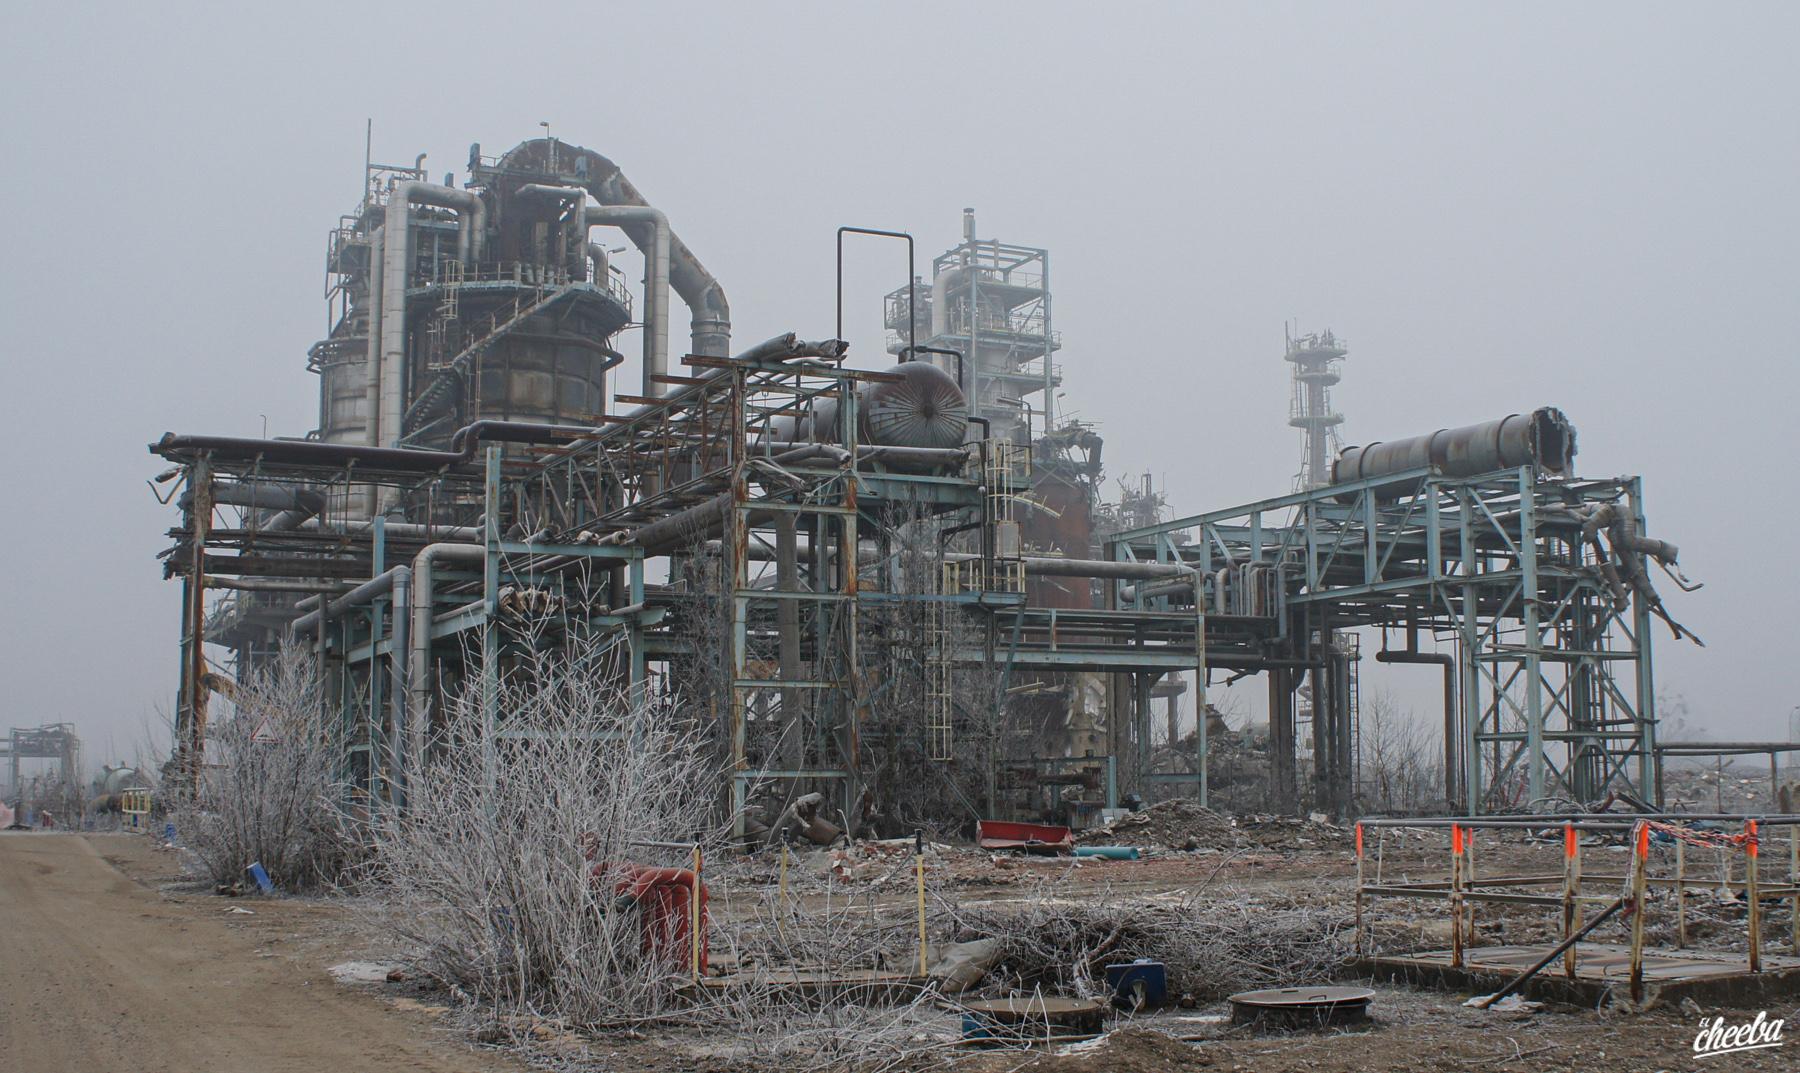 Urbex à la raffinerie Petroplus de Reichstett - Urbex Alsace by El Cheeba